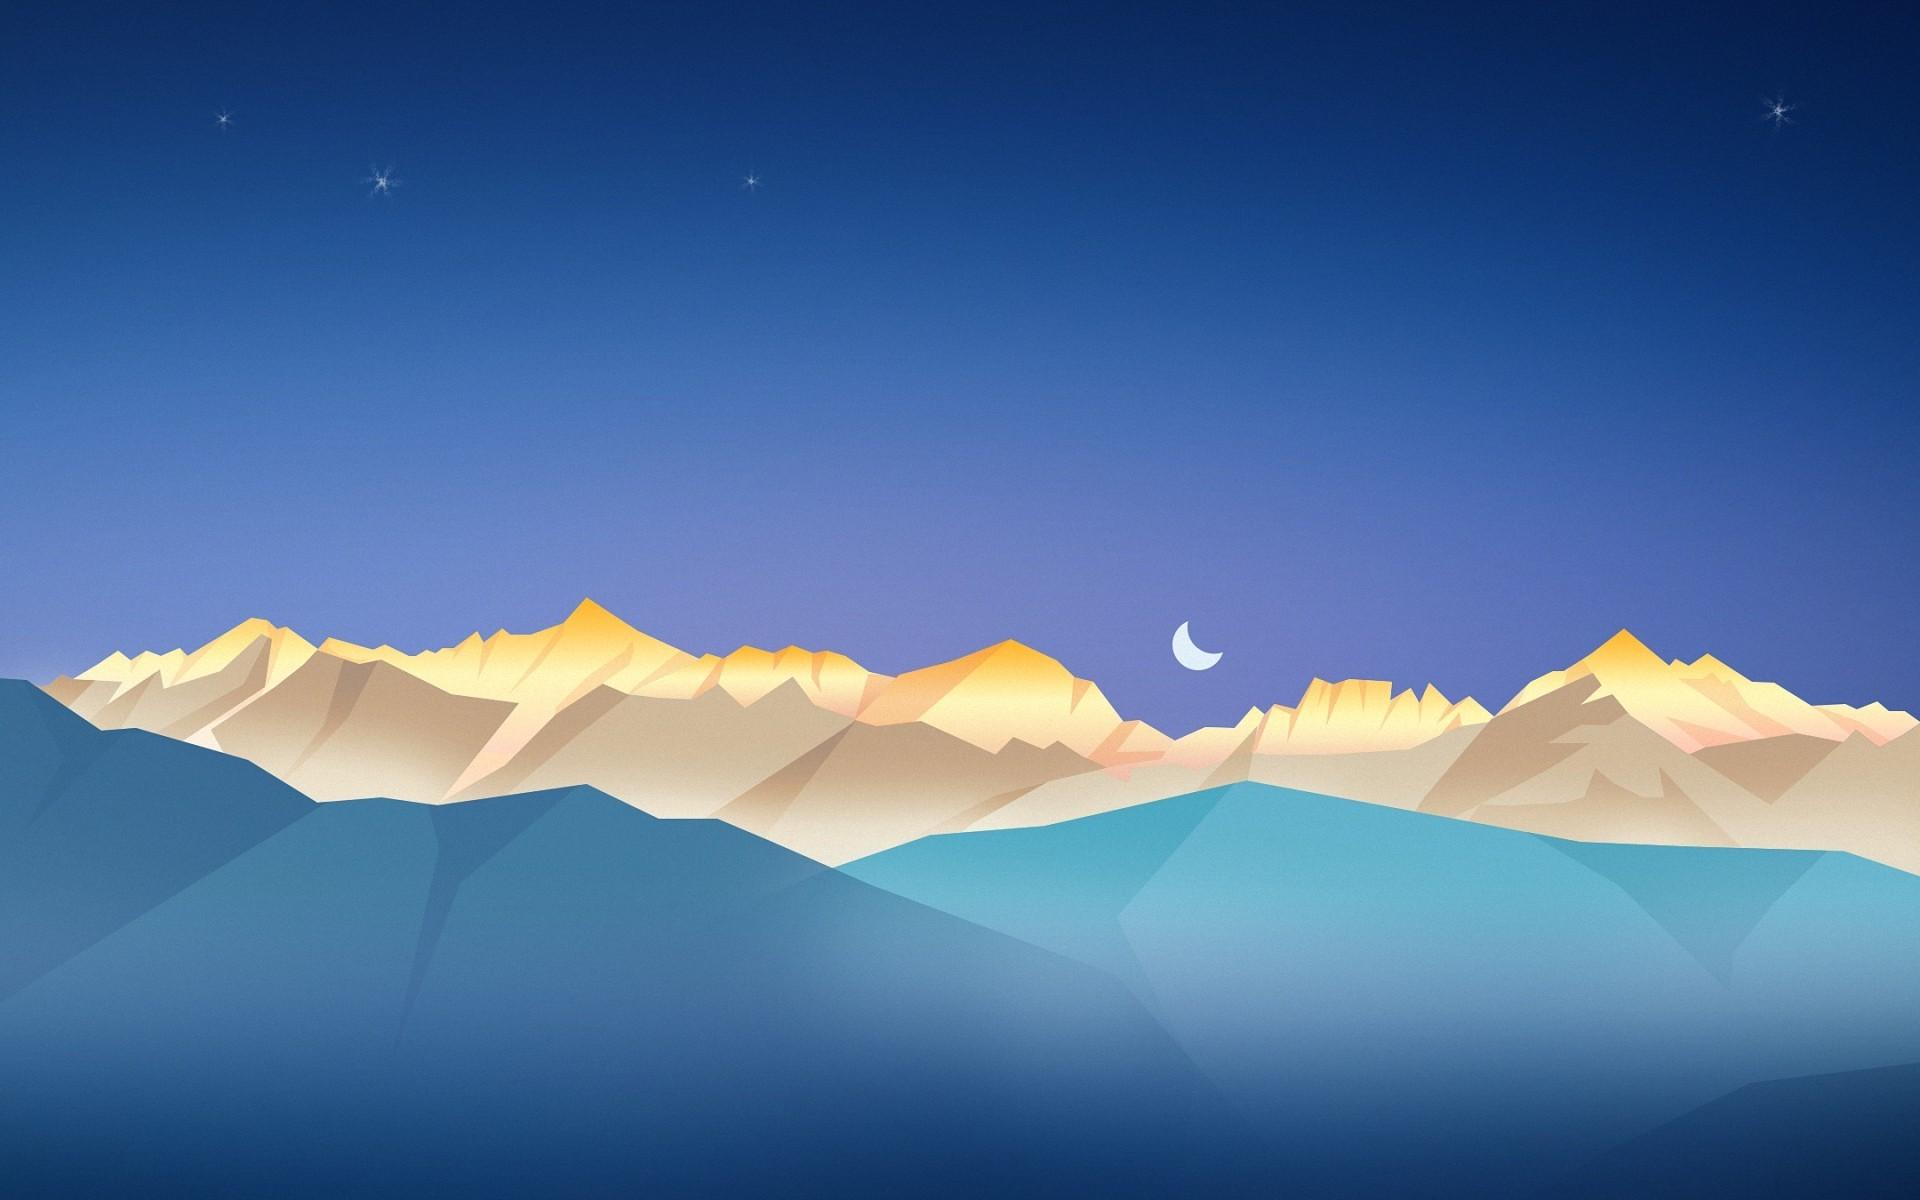 Simple Wallpaper Mountain Minimalistic - sunlight-landscape-night-minimalism-sky-artwork-horizon-atmosphere-plateau-cloud-mountain-plain-screenshot-1920x1200-px-natural-environment-computer-wallpaper-atmosphere-of-earth-ecosystem-mountain-range-620197  Pic_206699.jpg